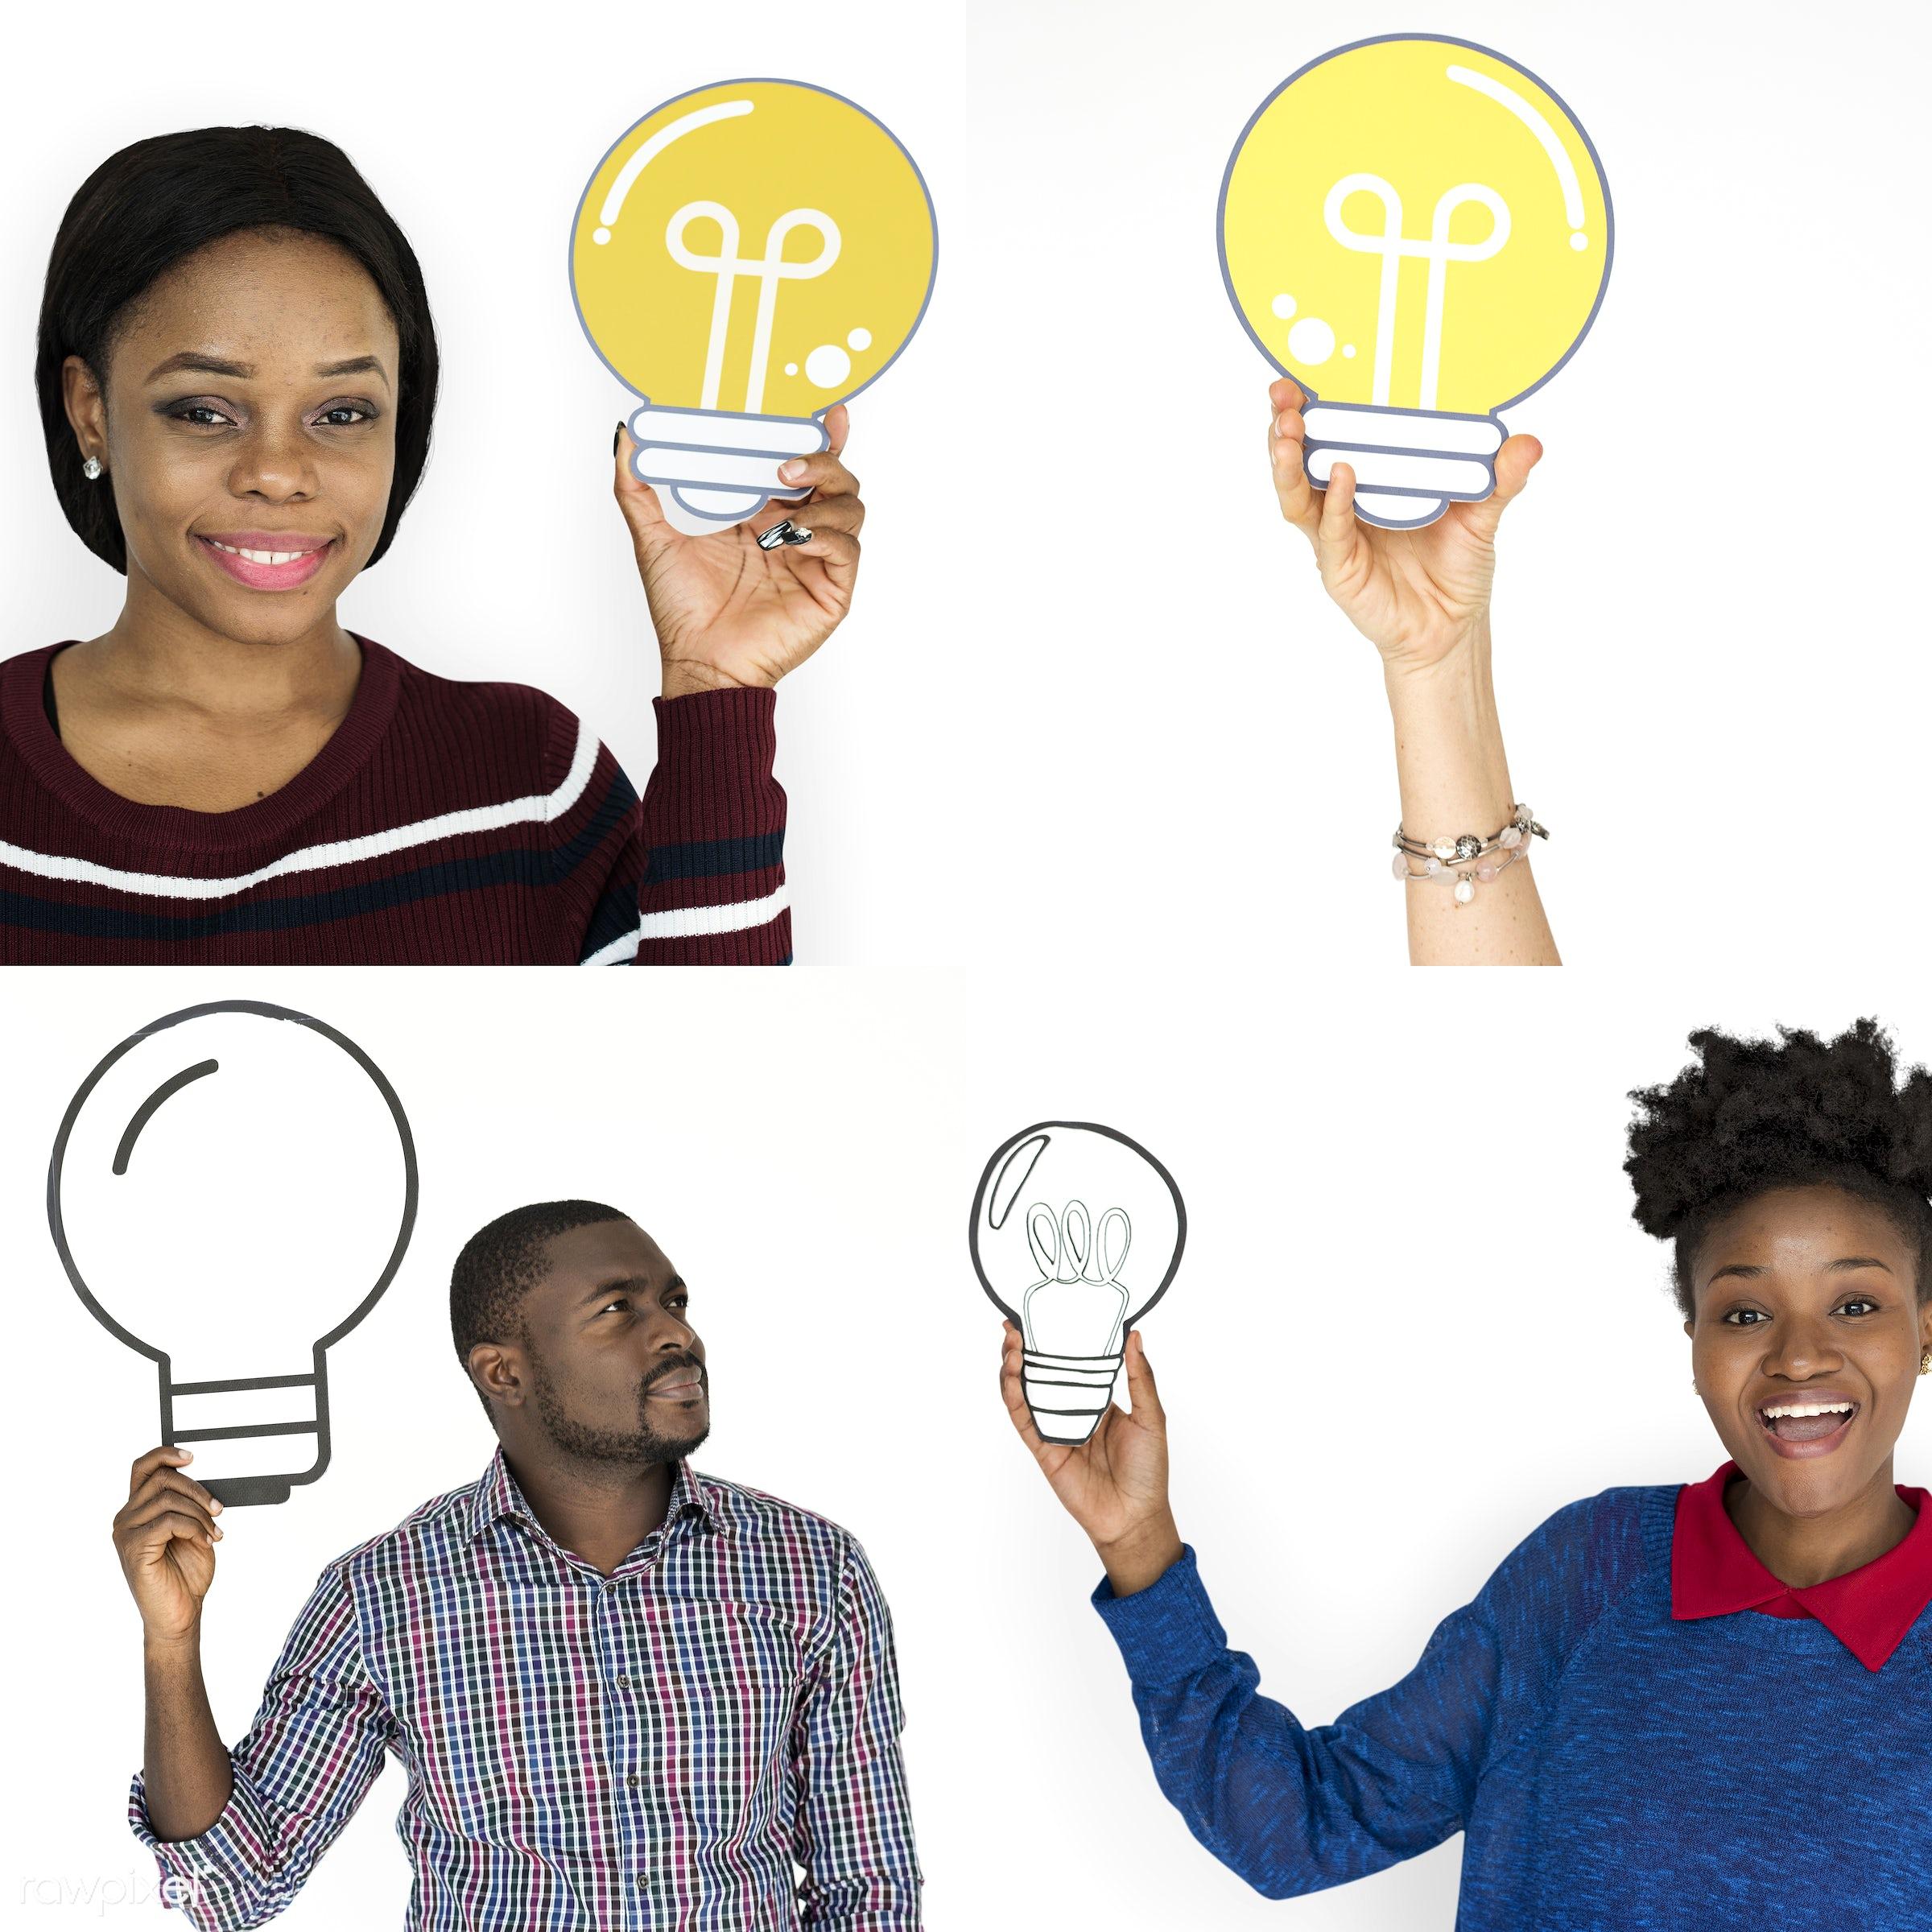 achievement, action, activities, adult, attitude, brainstorm, business, businessman, casual, collage, create, creation,...